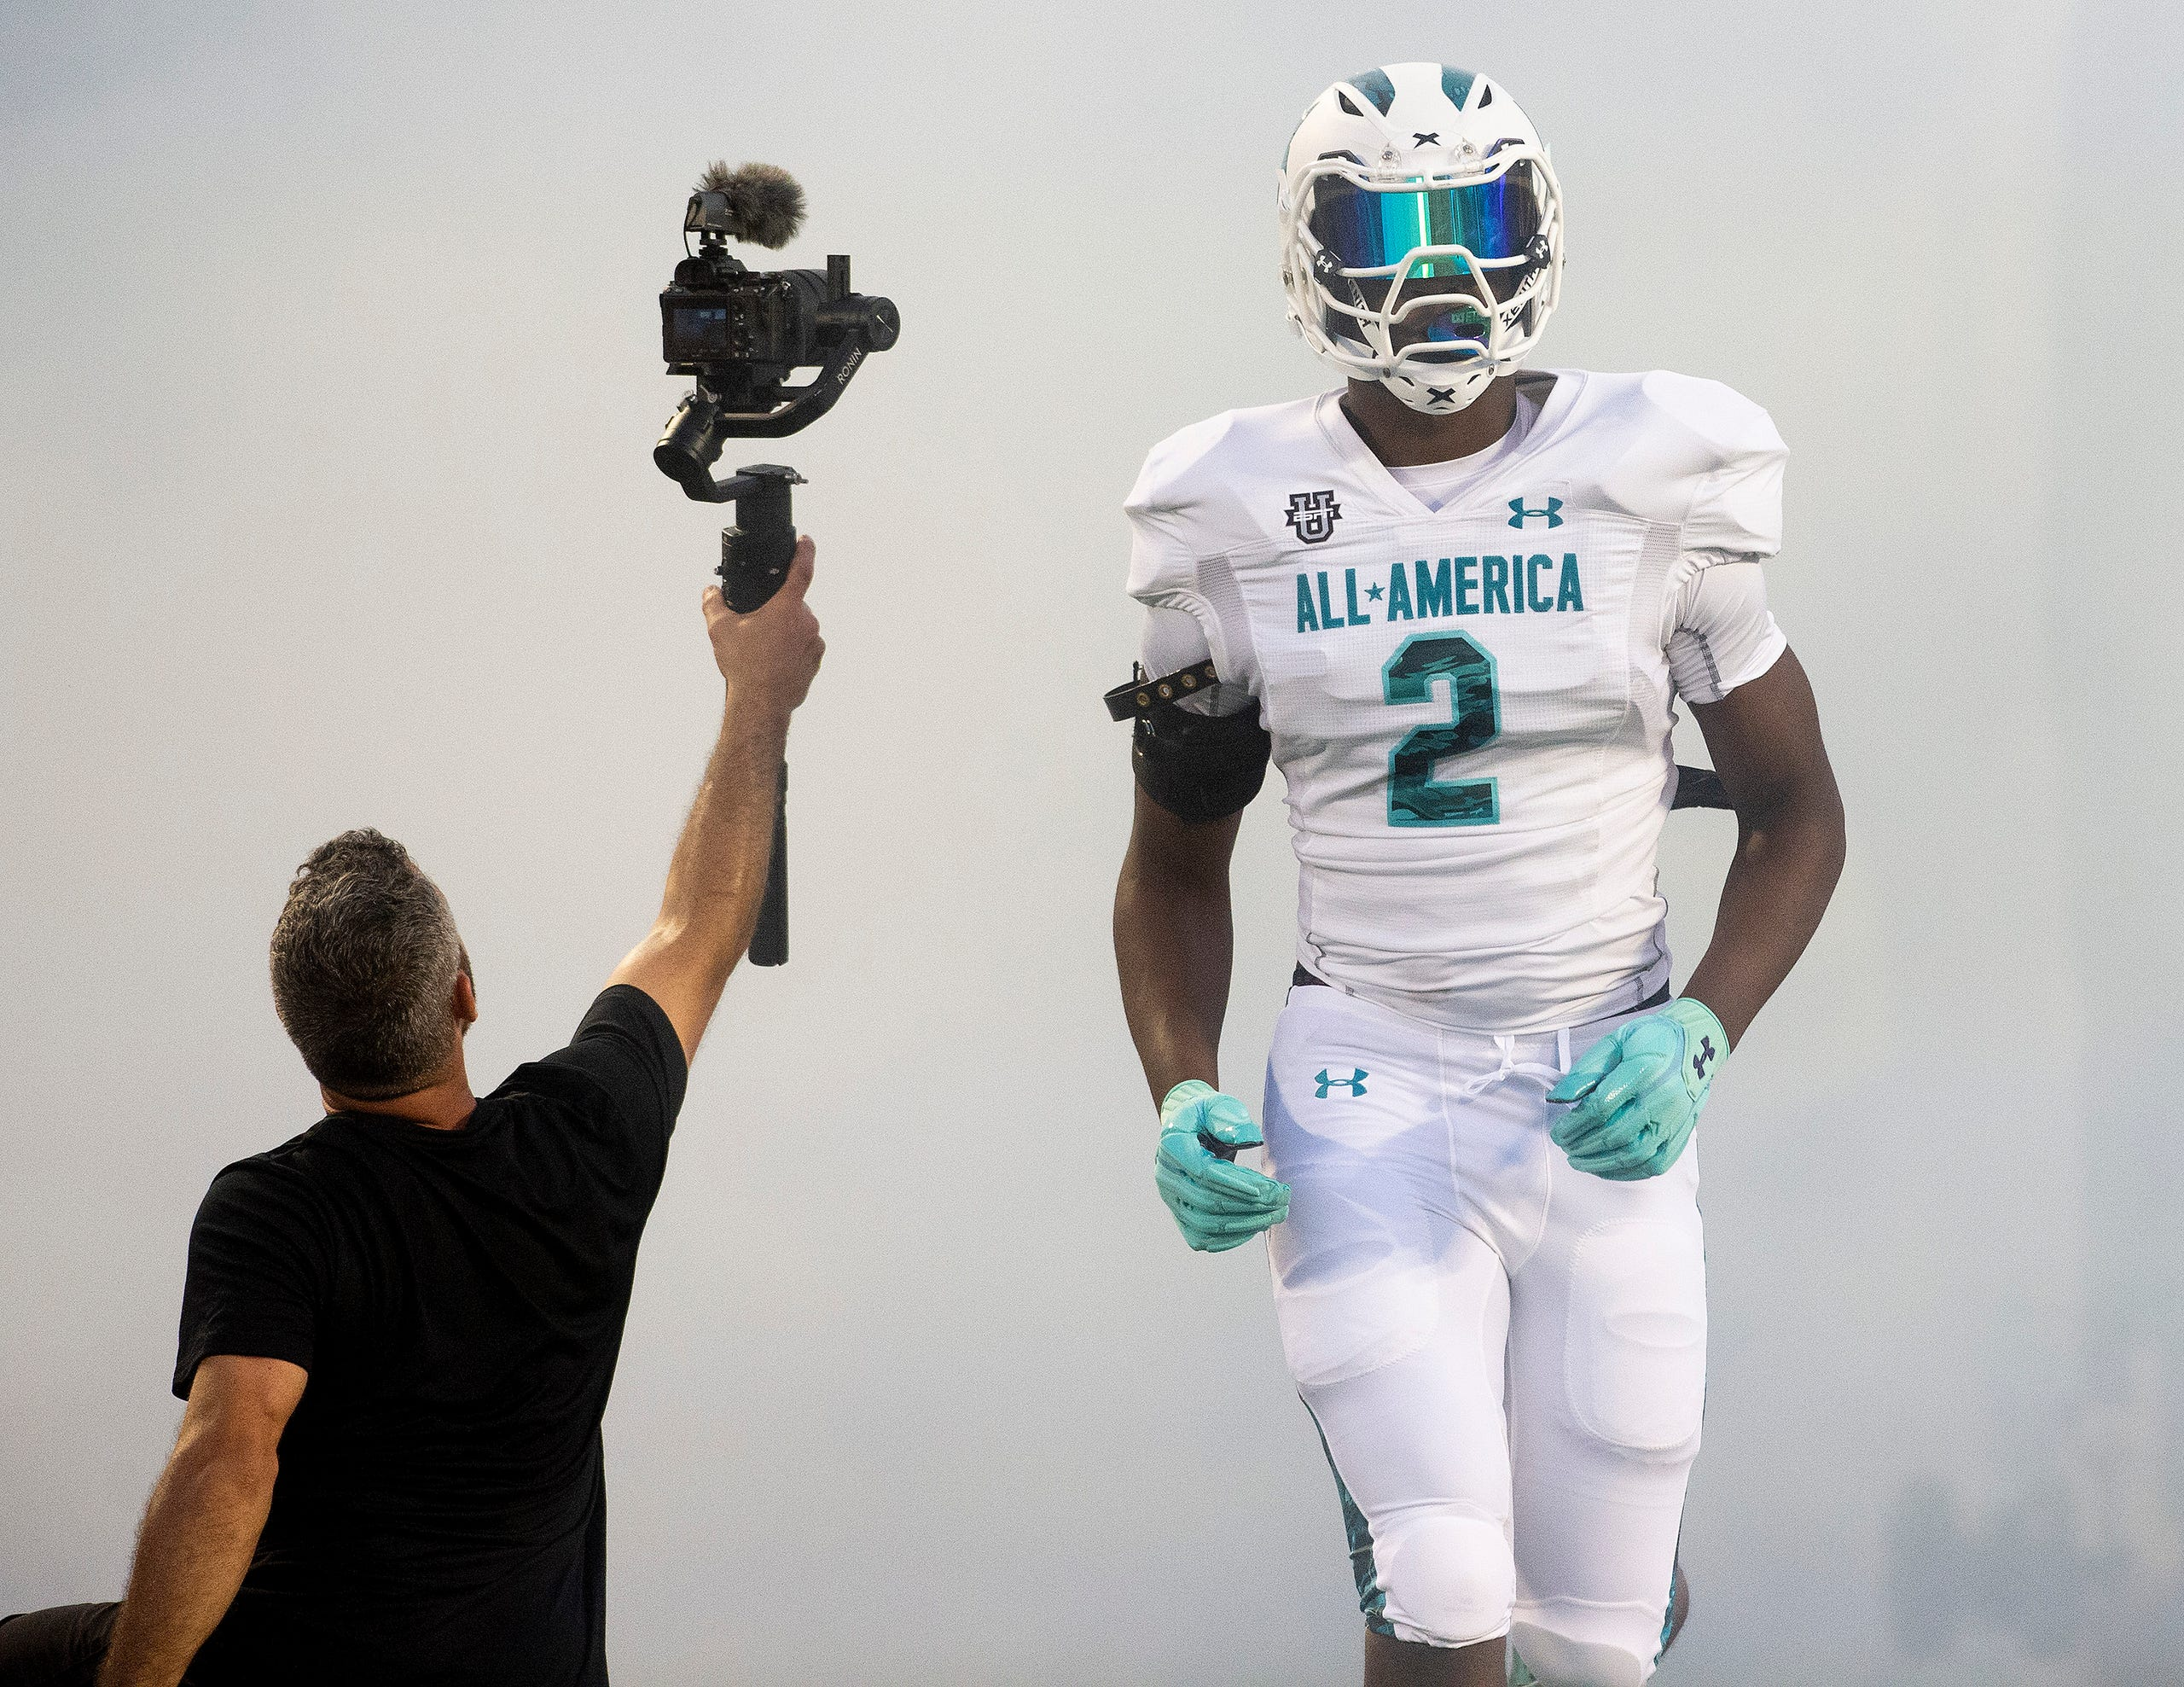 Organo Redundante unir  College prospects shine in Under Armour All-America Game